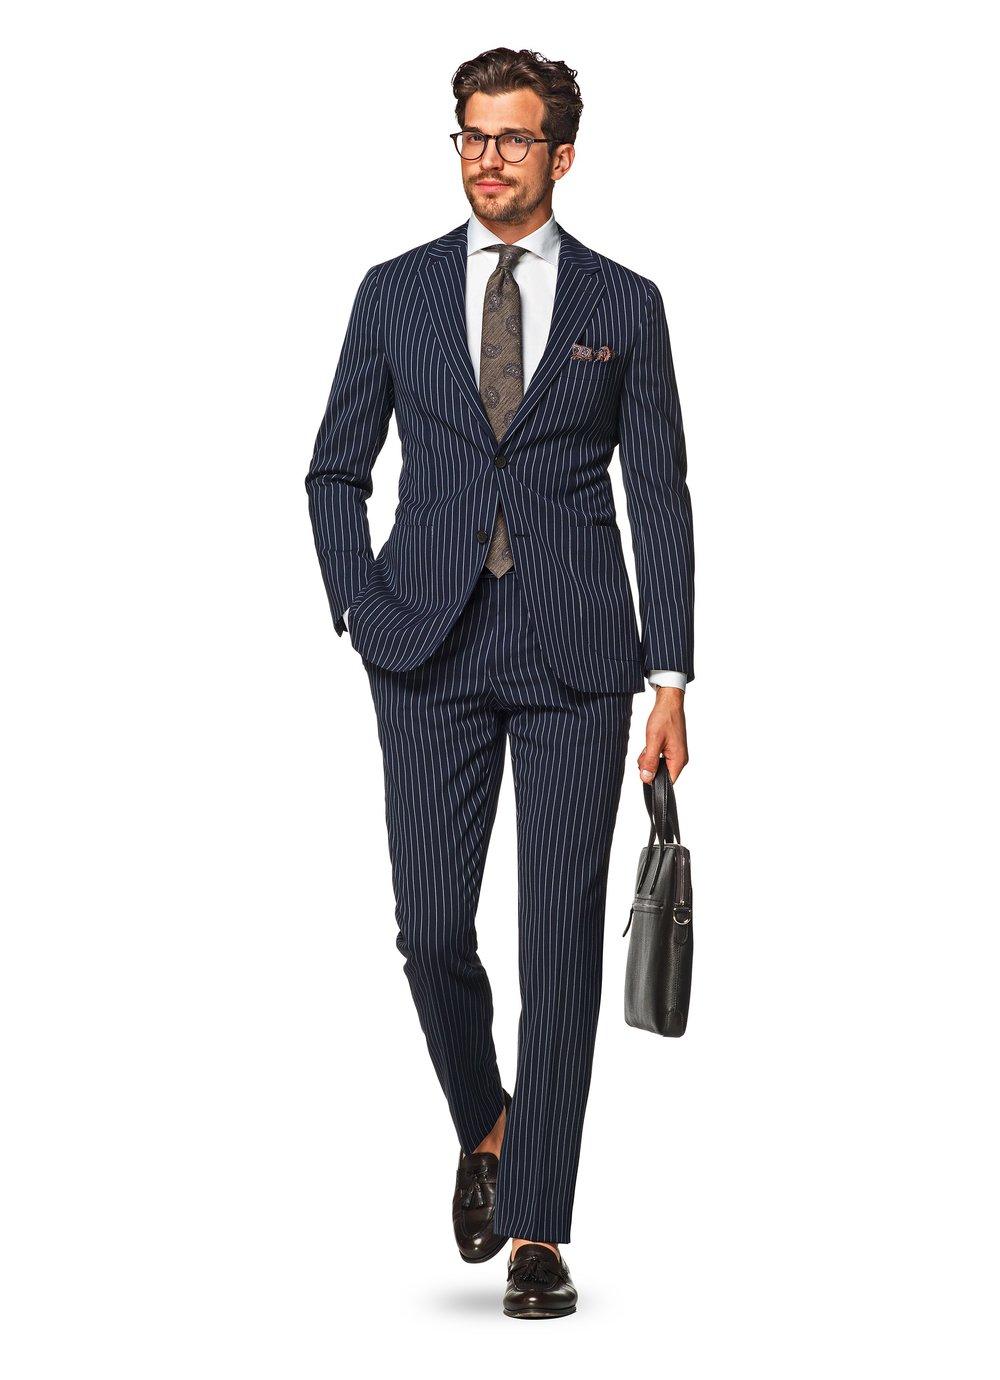 Suits_Blue_Stripe_Havana_P5112_Suitsupply_Online_Store_1.jpg